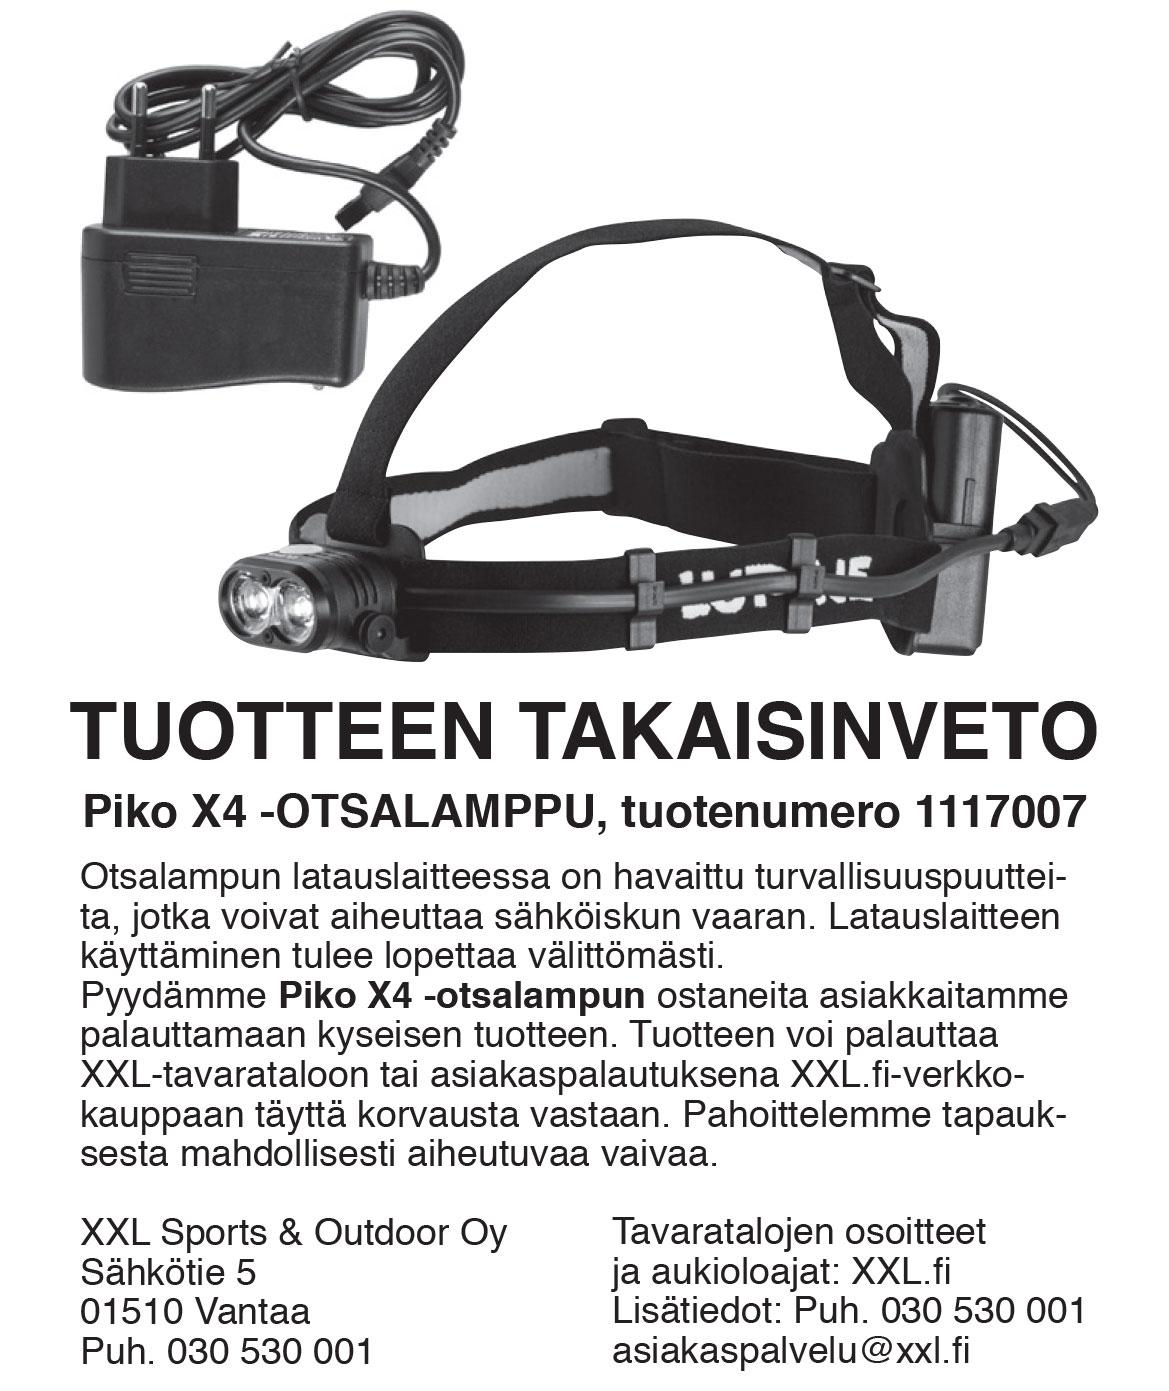 piko4x_takasinveto_info.jpg